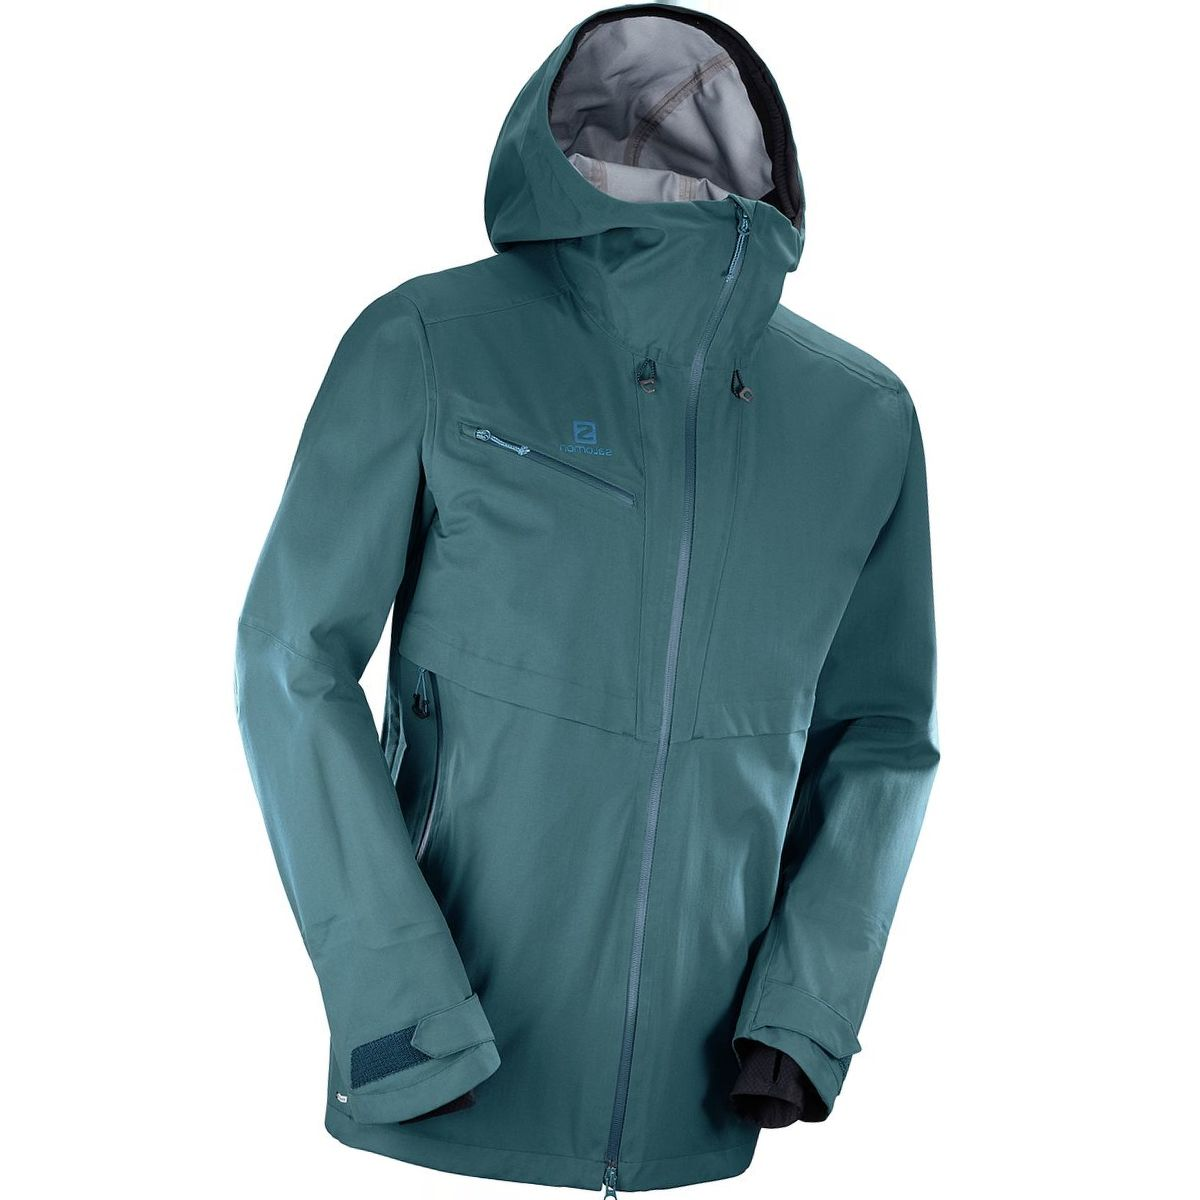 Salomon QST Guard 3L Hooded Jacket - Men's